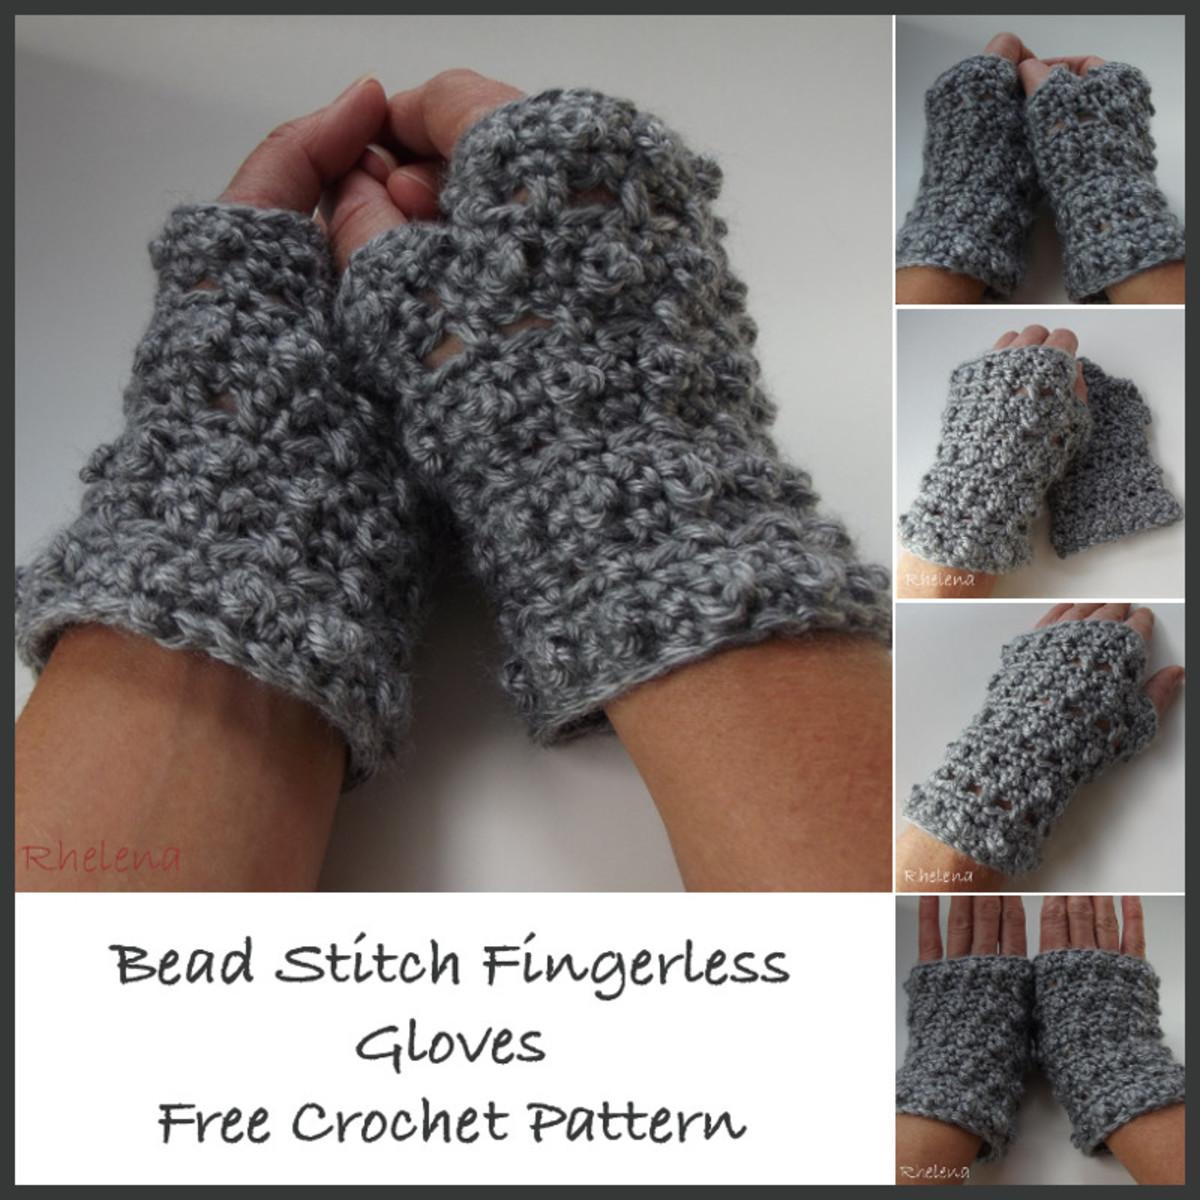 Bead Stitch Fingerless Gloves